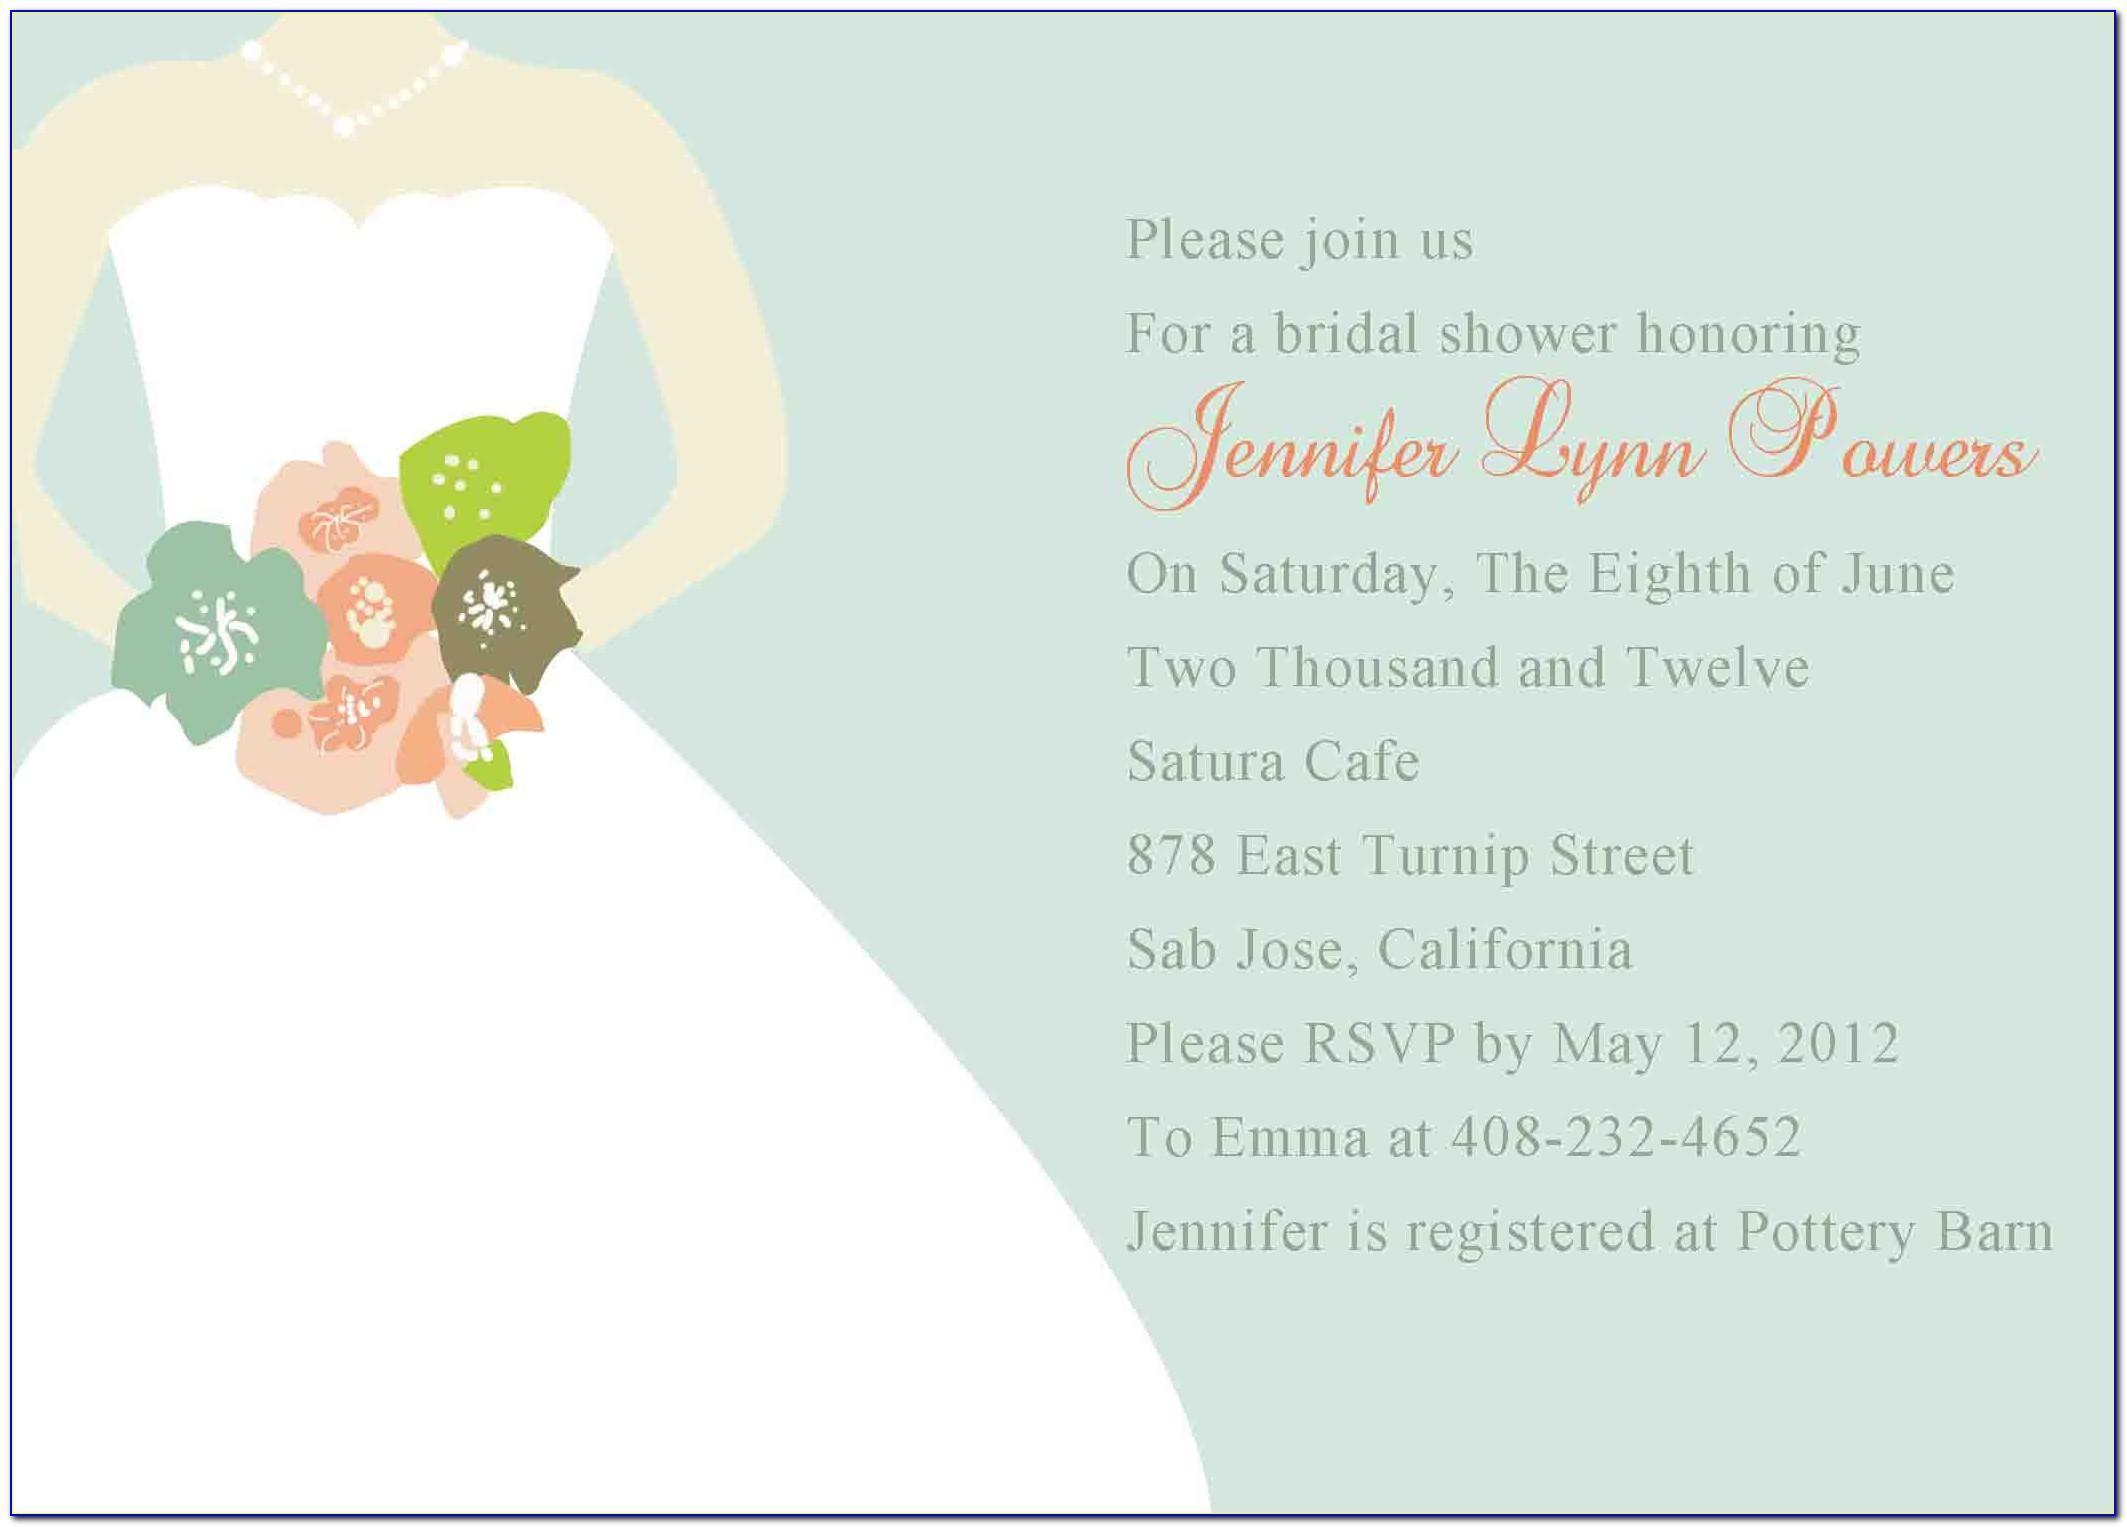 Bridal Shower Invitation Free Template